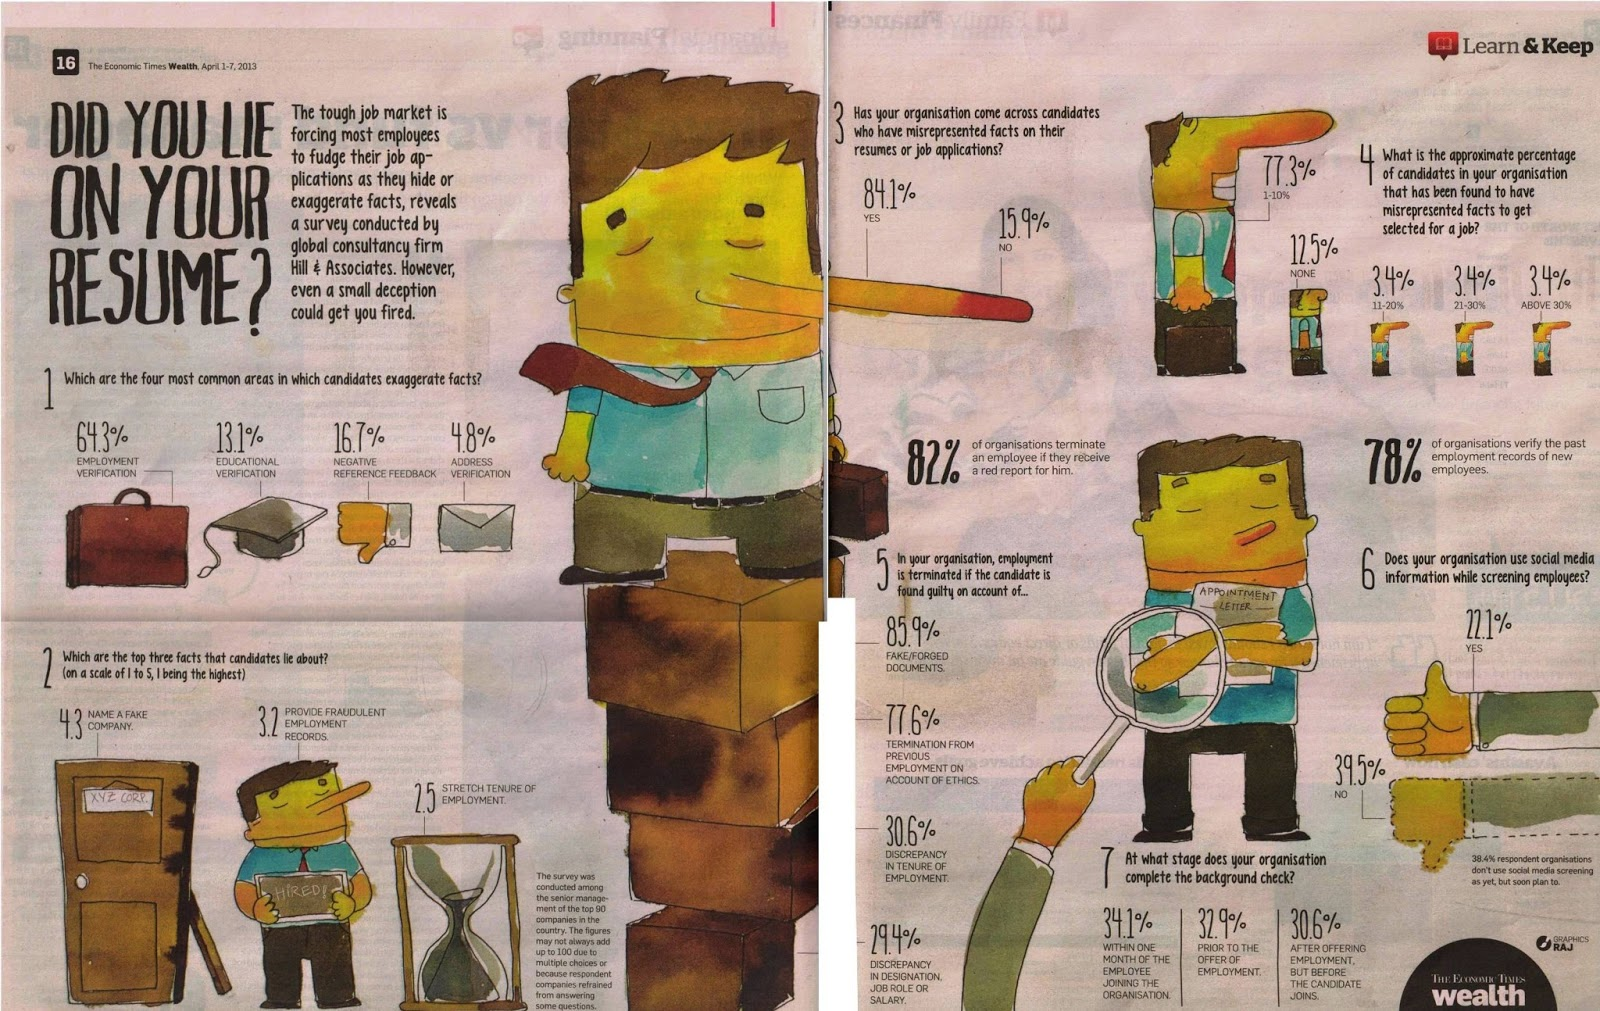 Shalini Chakravorty Economic Times 1 April 2013 Did you lie on your resume